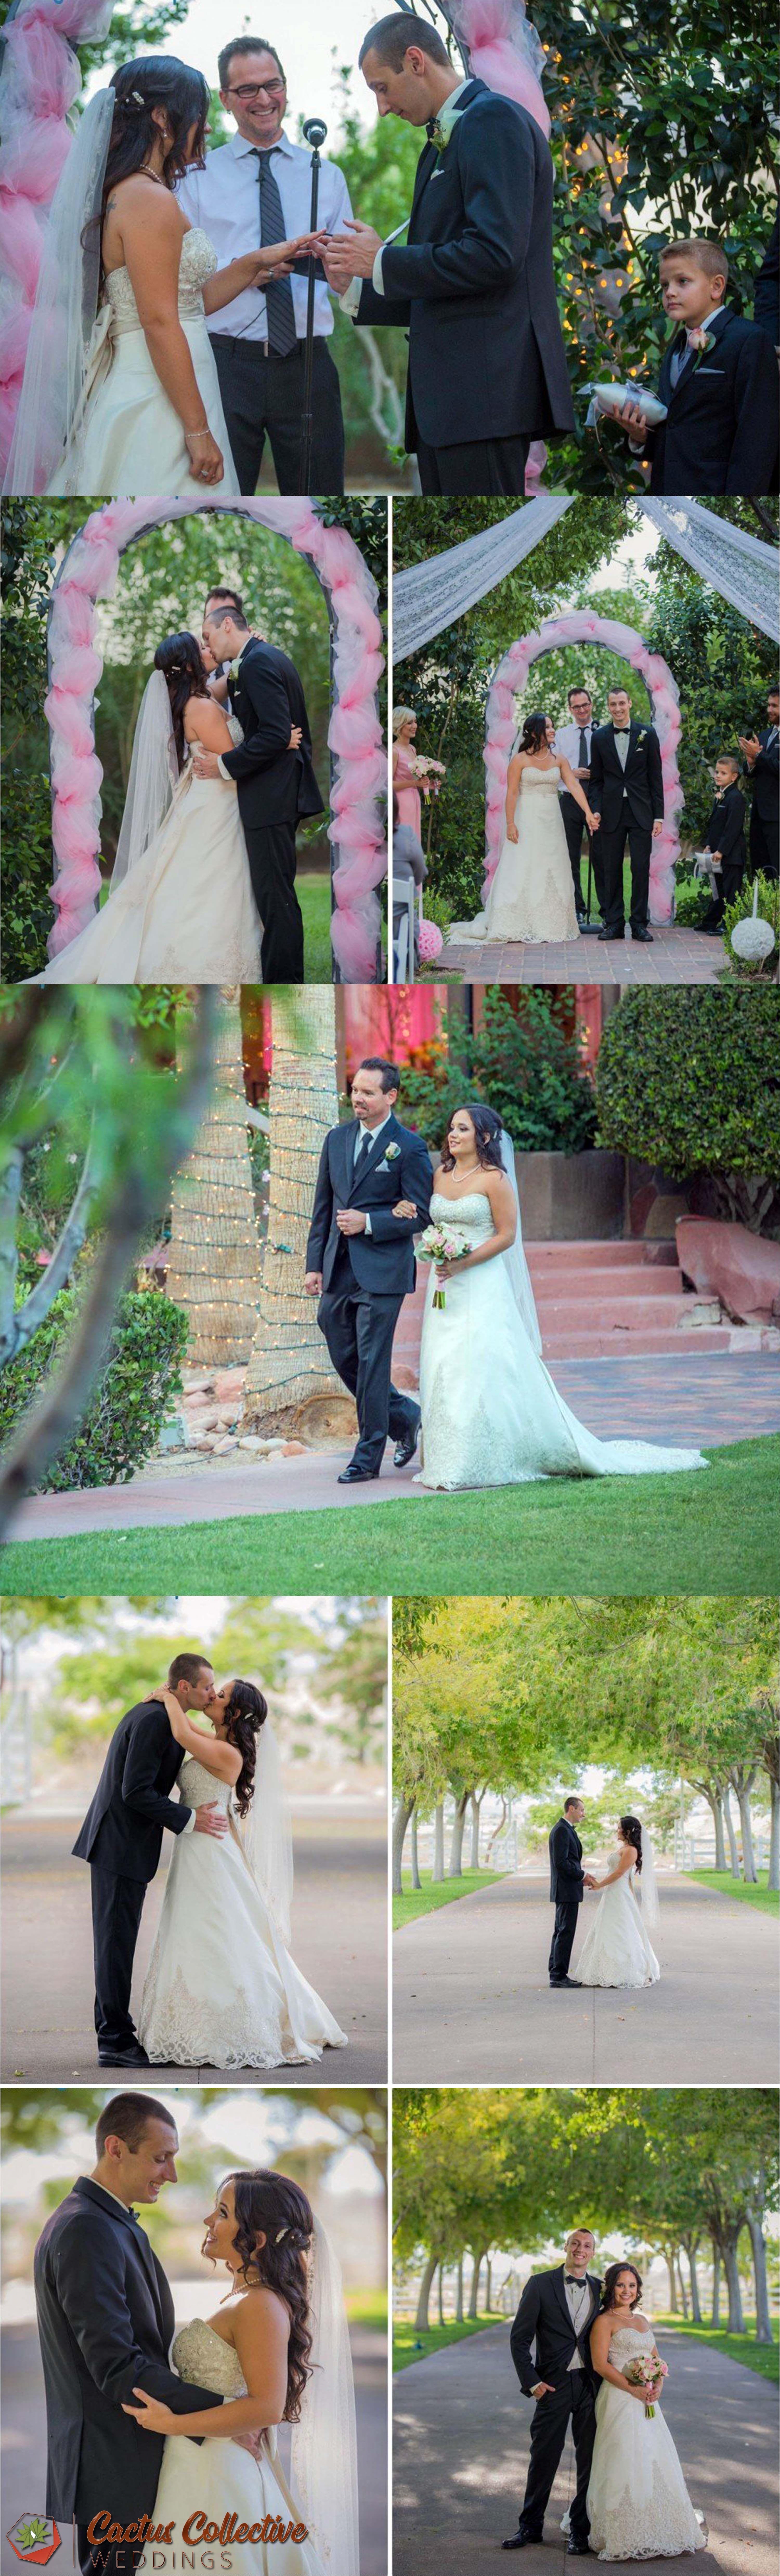 Blog Intimate wedding ceremony, Wedding, Intimate wedding